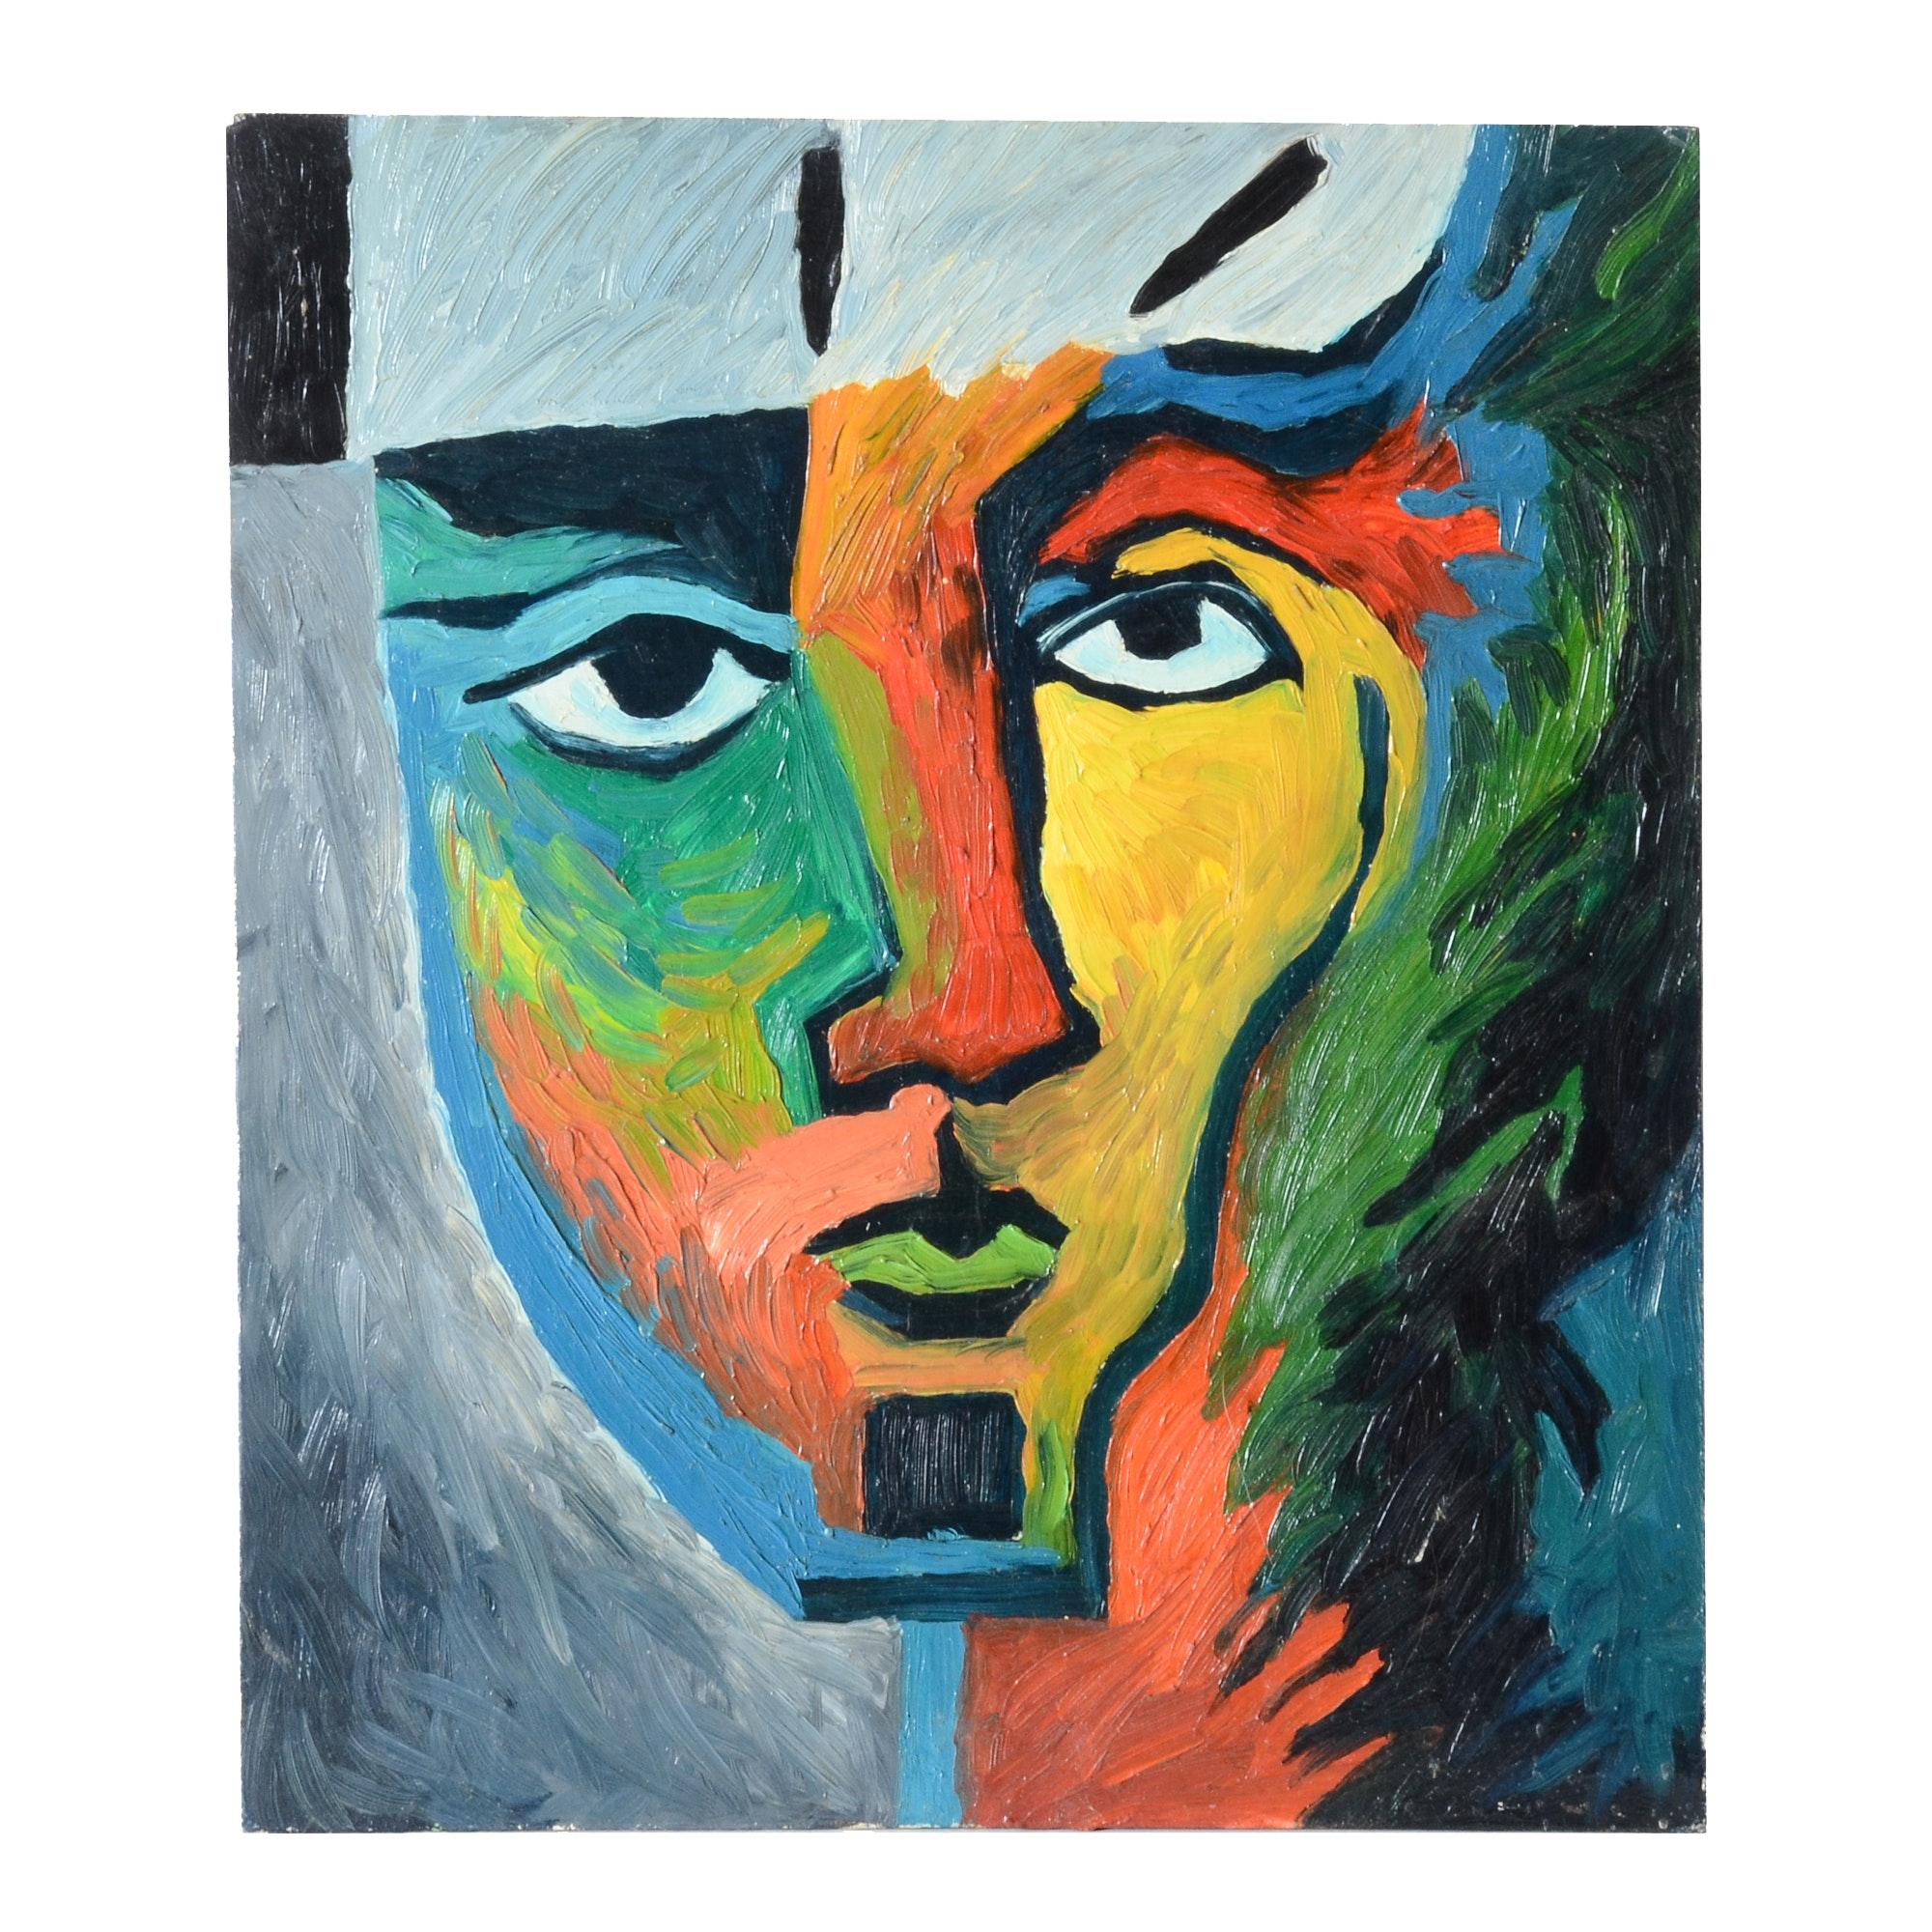 Carol J. Mathews Oil Painting of an Abstract Face